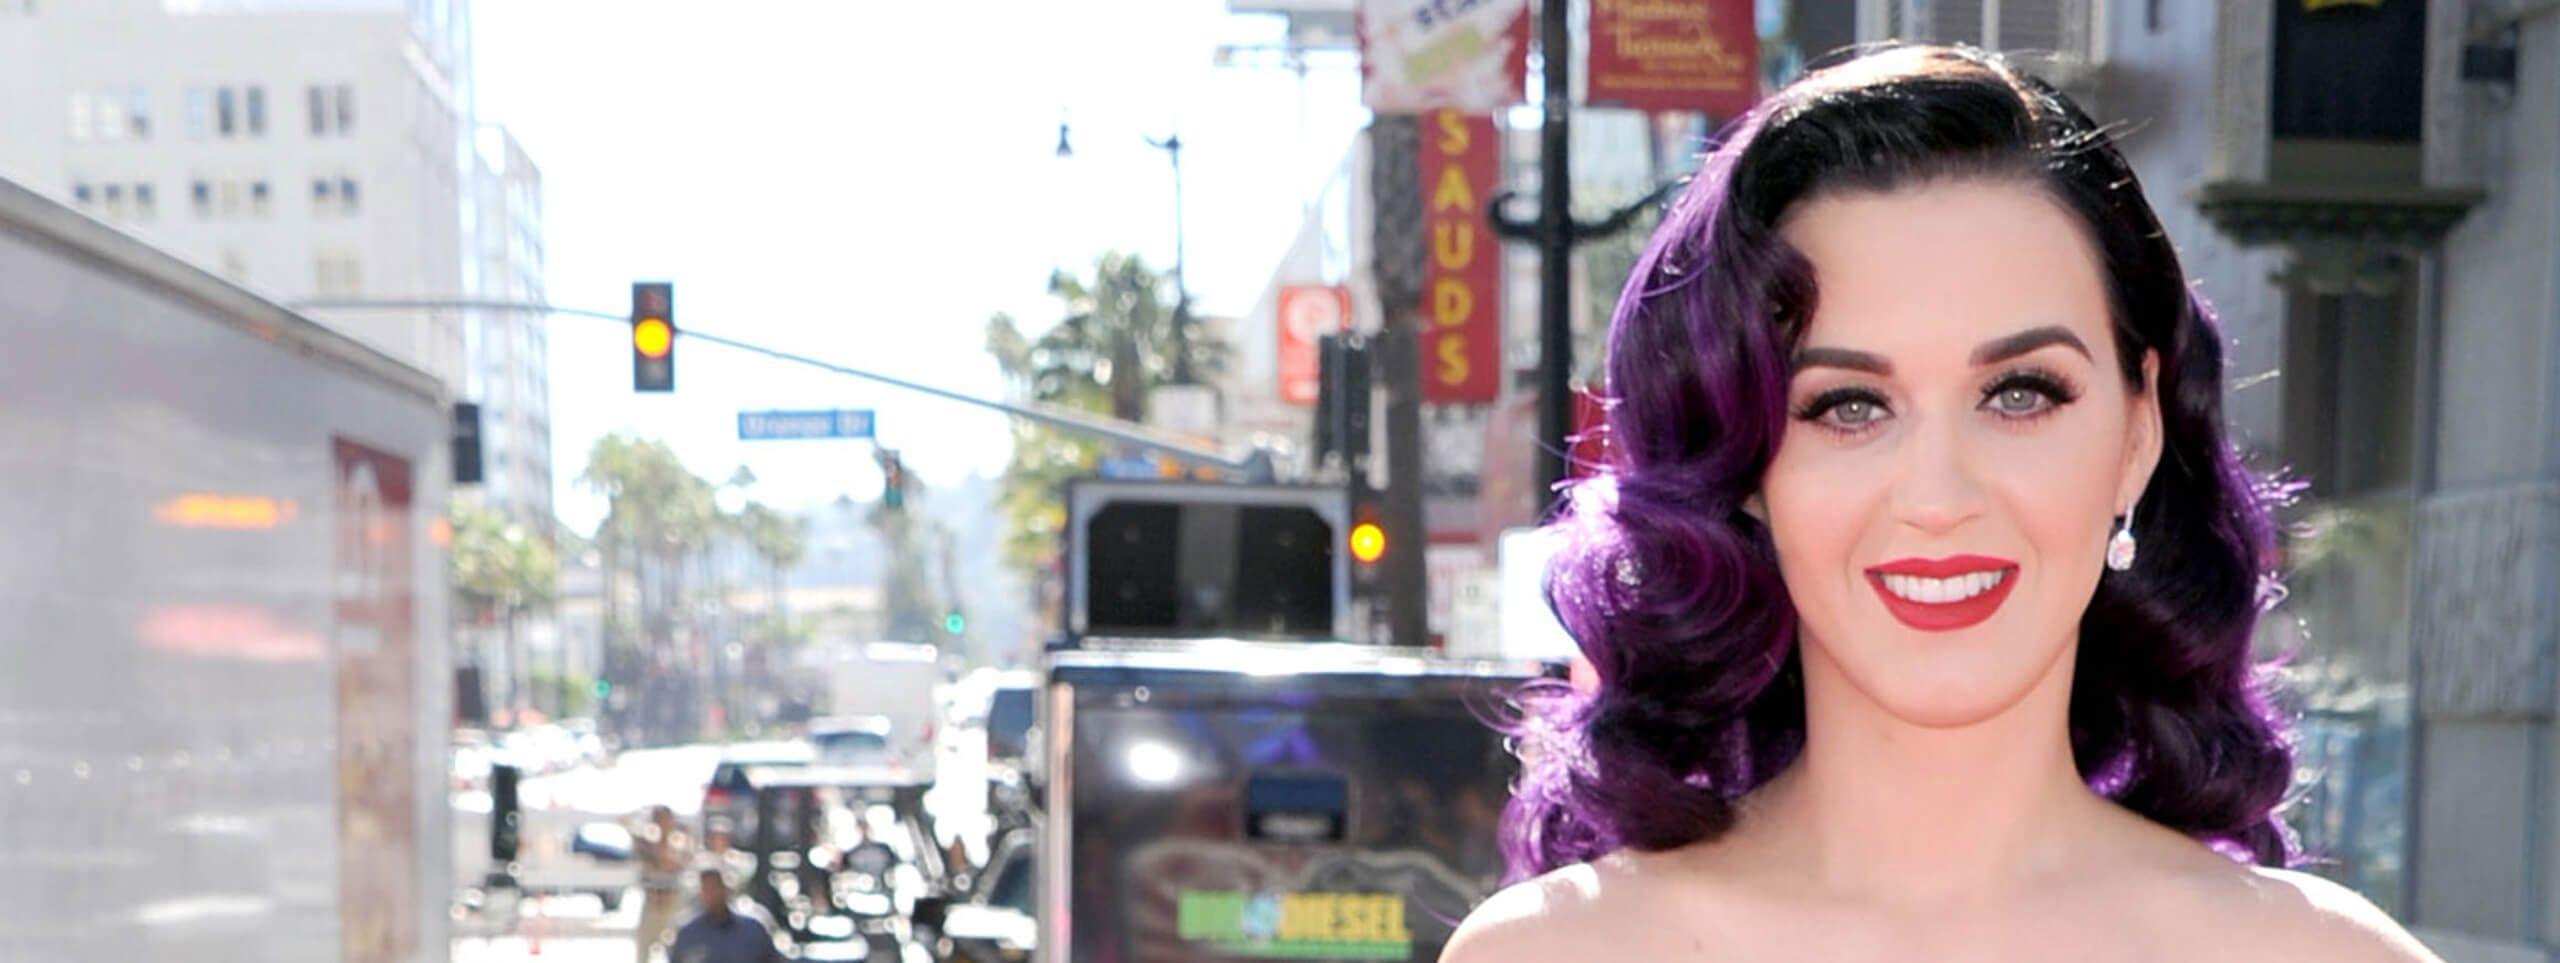 Katy Perry acconciatura con ricci colorati viola